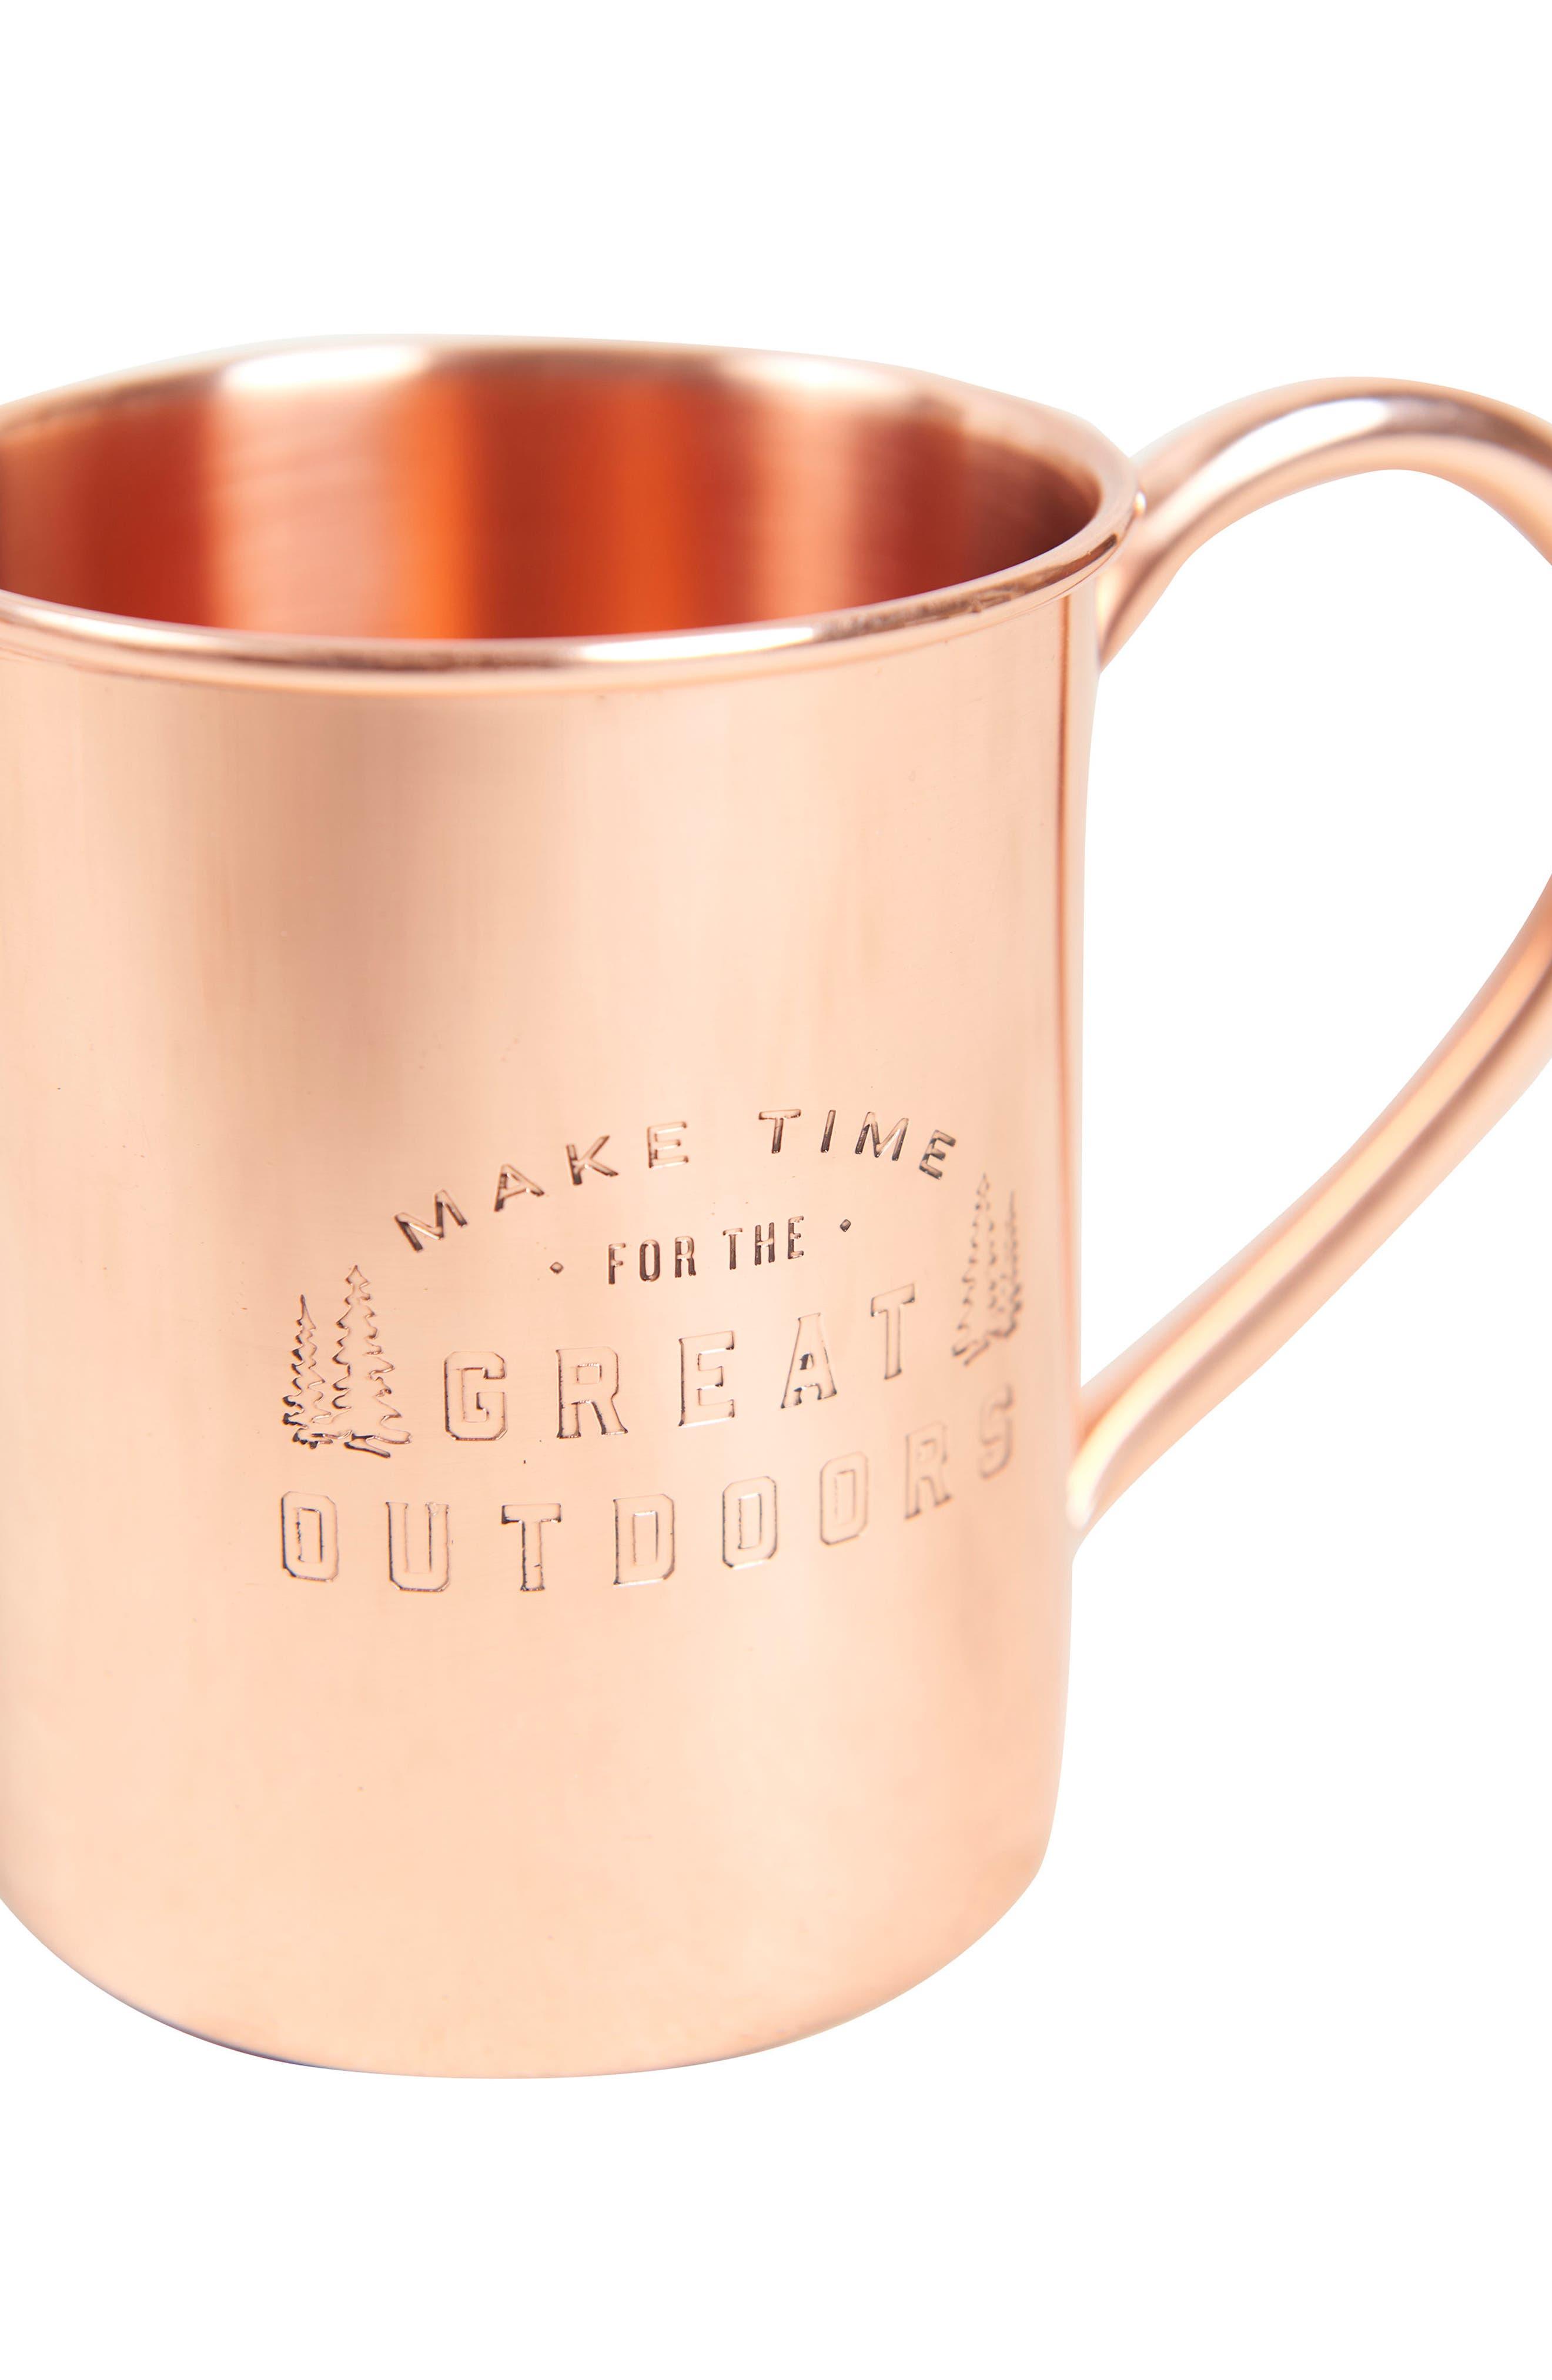 UNITED BY BLUE,                             Engraved Copper Mug,                             Alternate thumbnail 2, color,                             220